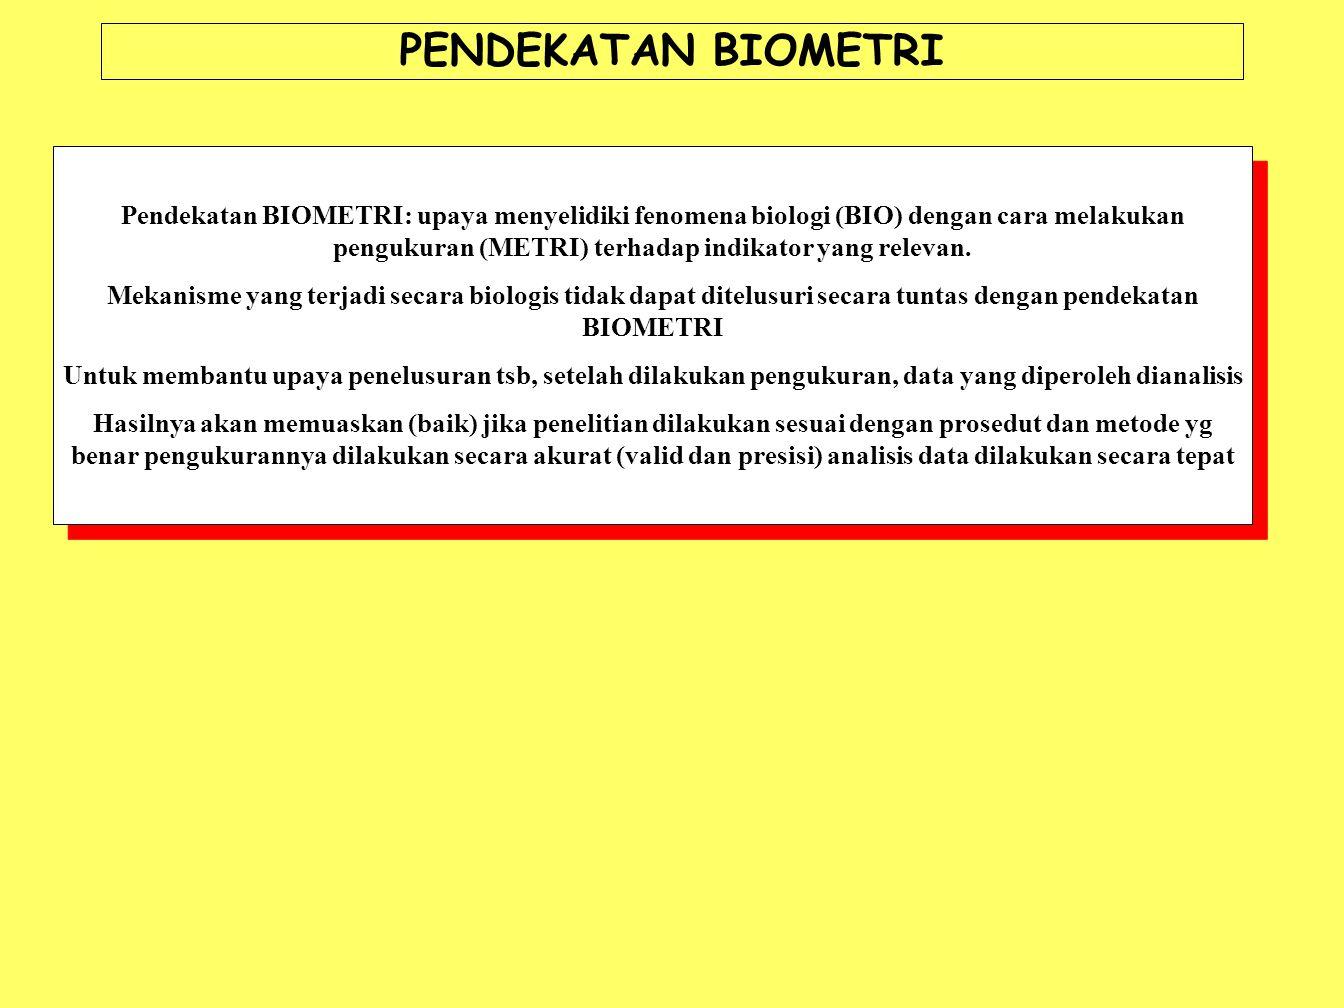 PENDEKATAN BIOMETRI Pendekatan BIOMETRI: upaya menyelidiki fenomena biologi (BIO) dengan cara melakukan pengukuran (METRI) terhadap indikator yang rel